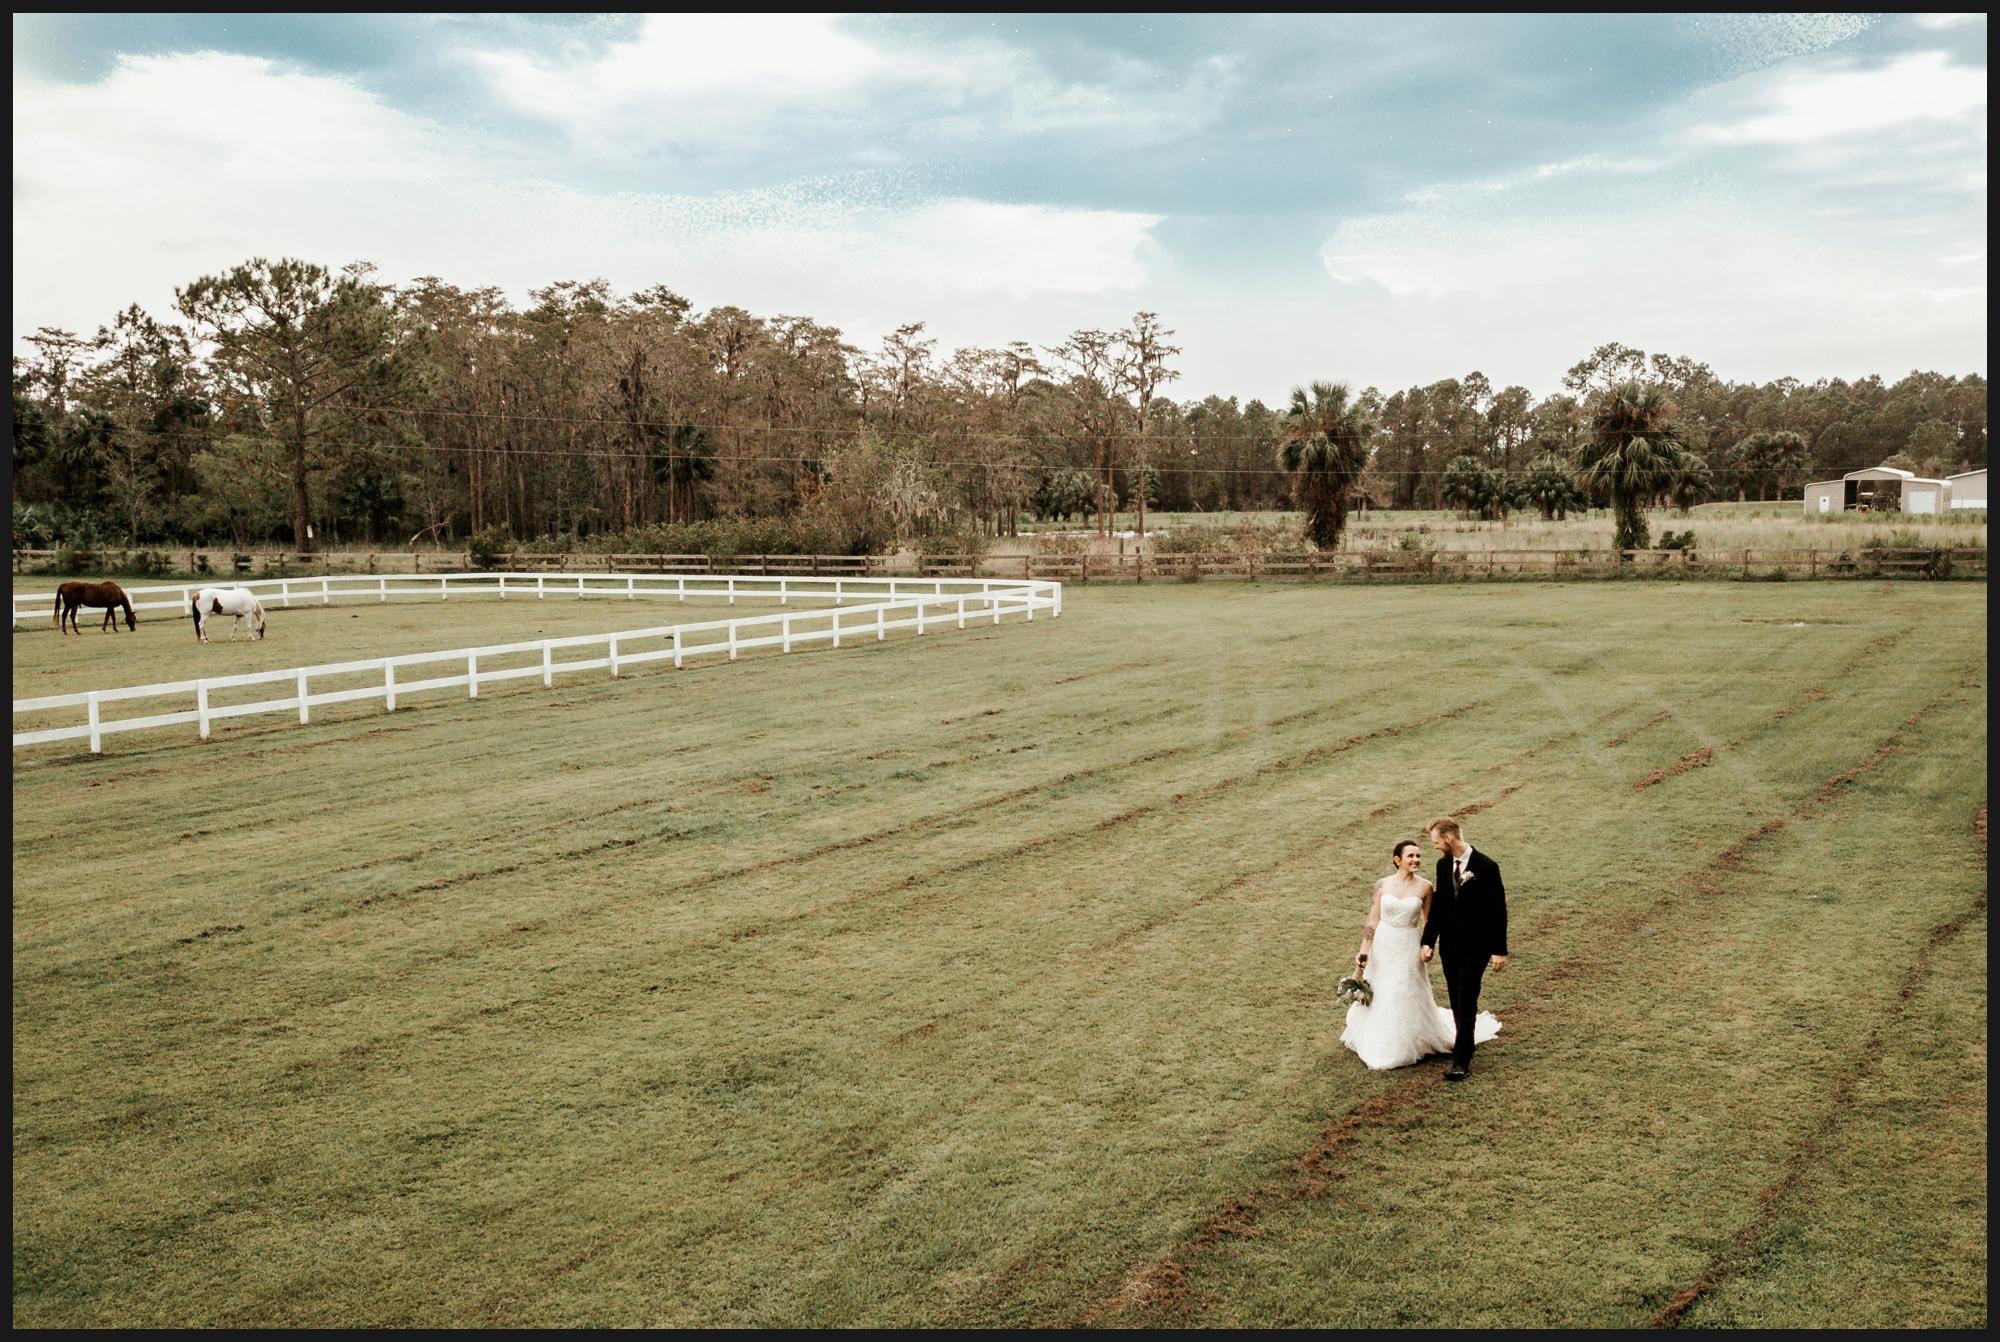 Orlando-Wedding-Photographer-destination-wedding-photographer-florida-wedding-photographer-bohemian-wedding-photographer_0367.jpg